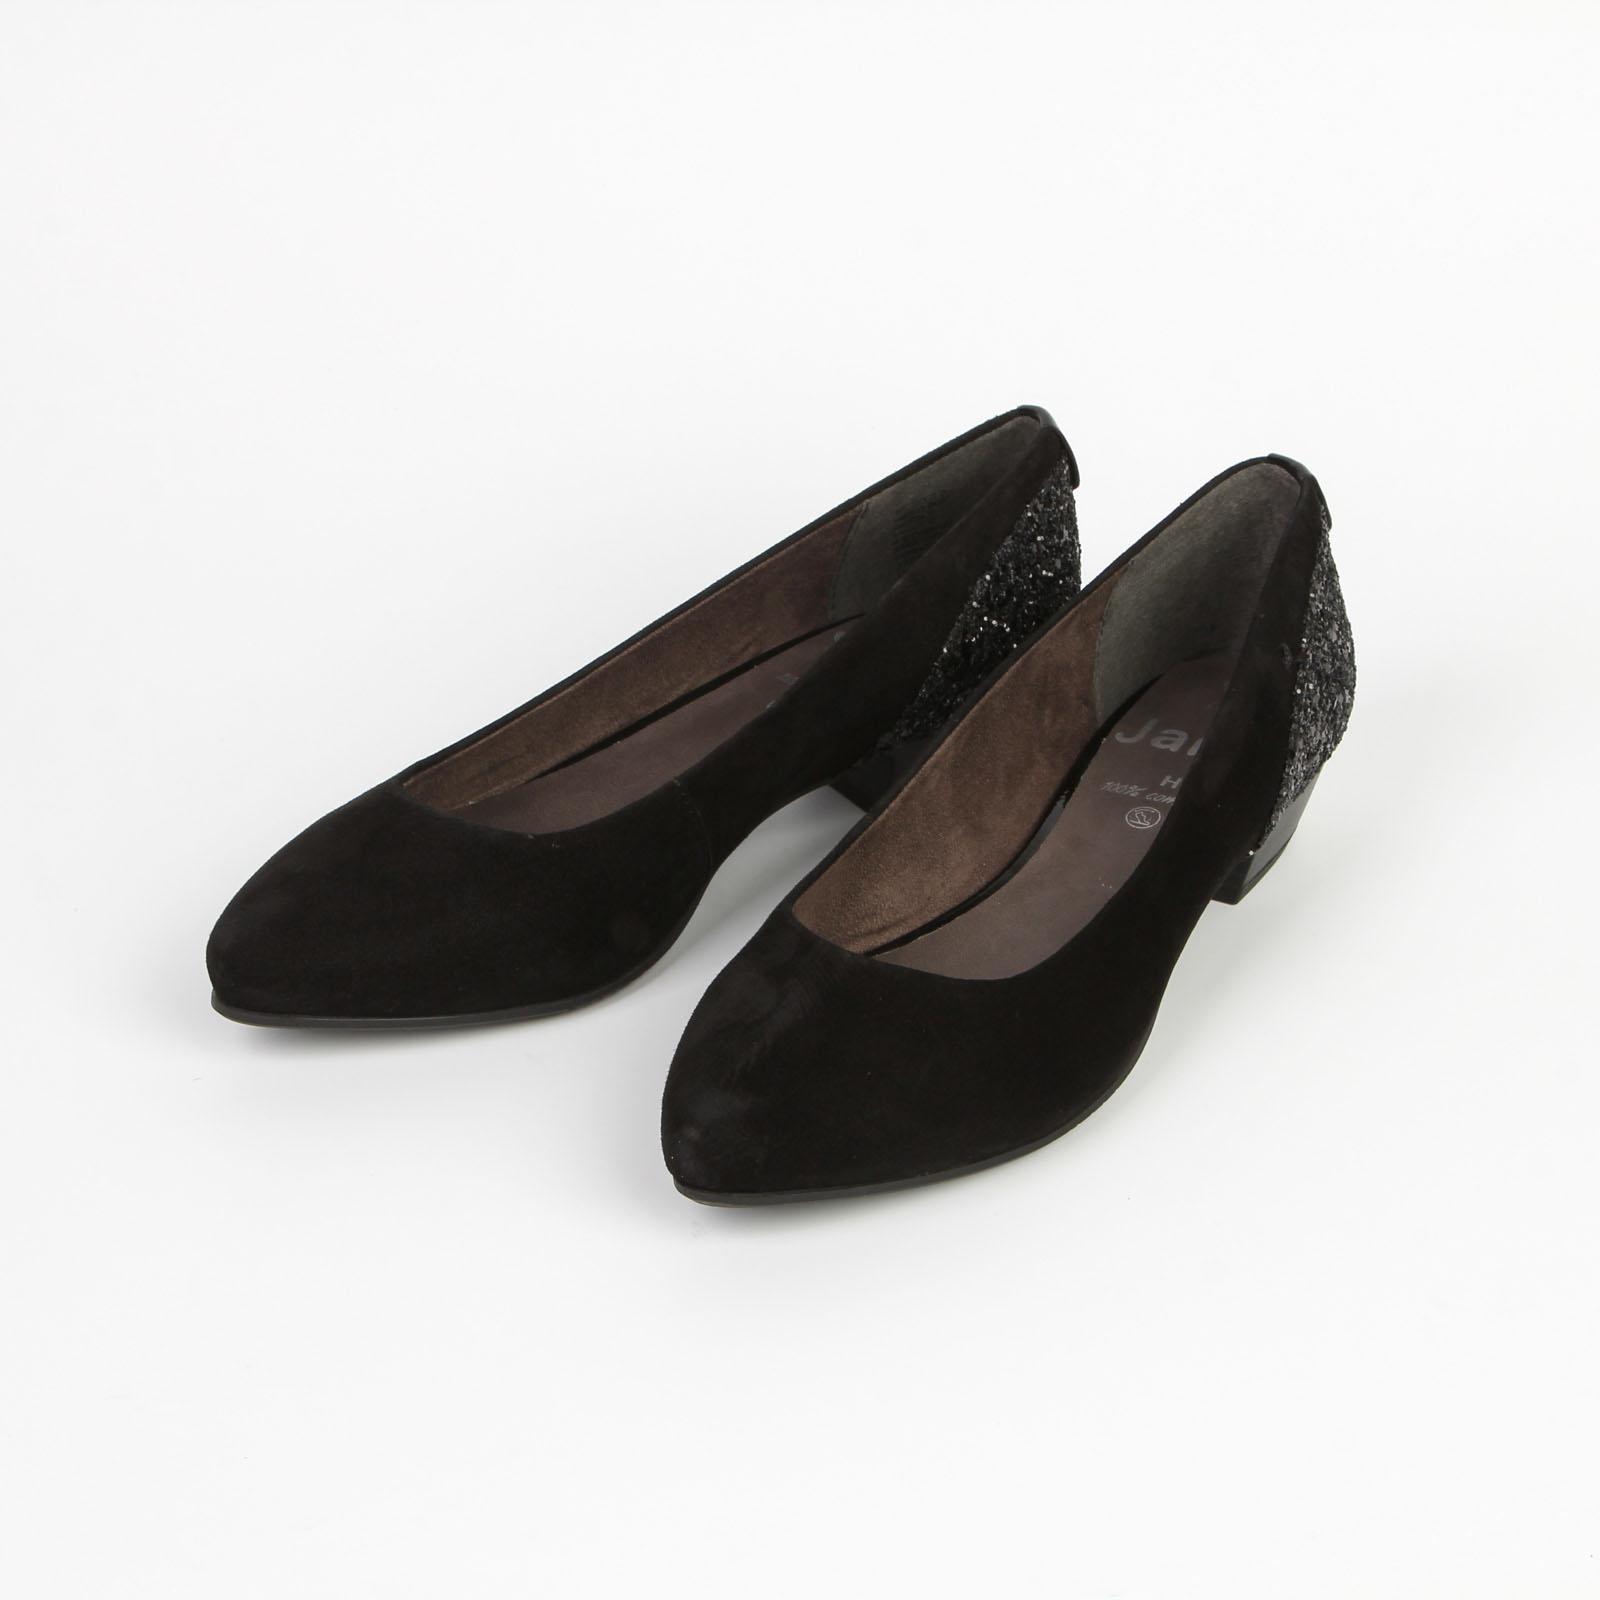 Лодочки женские классические на устойчивом каблуке